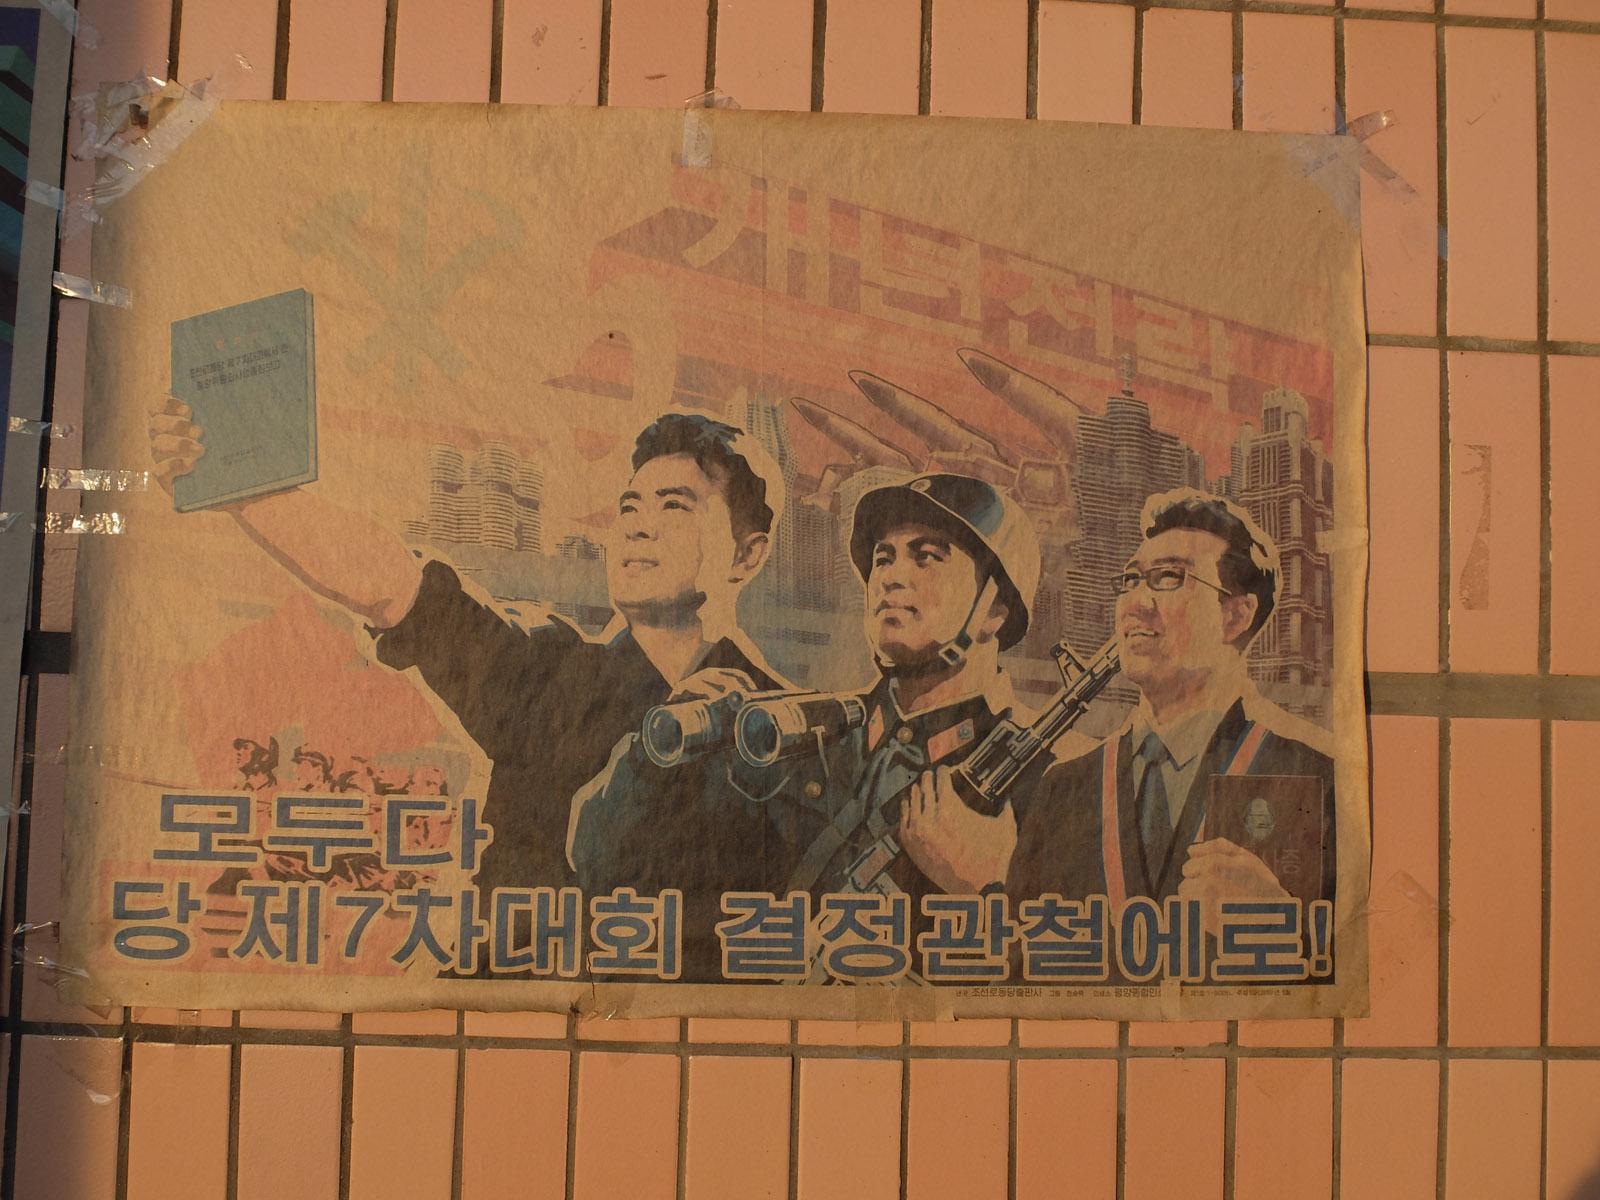 Пропагандистские плакаты в баре. Фото: Munchies